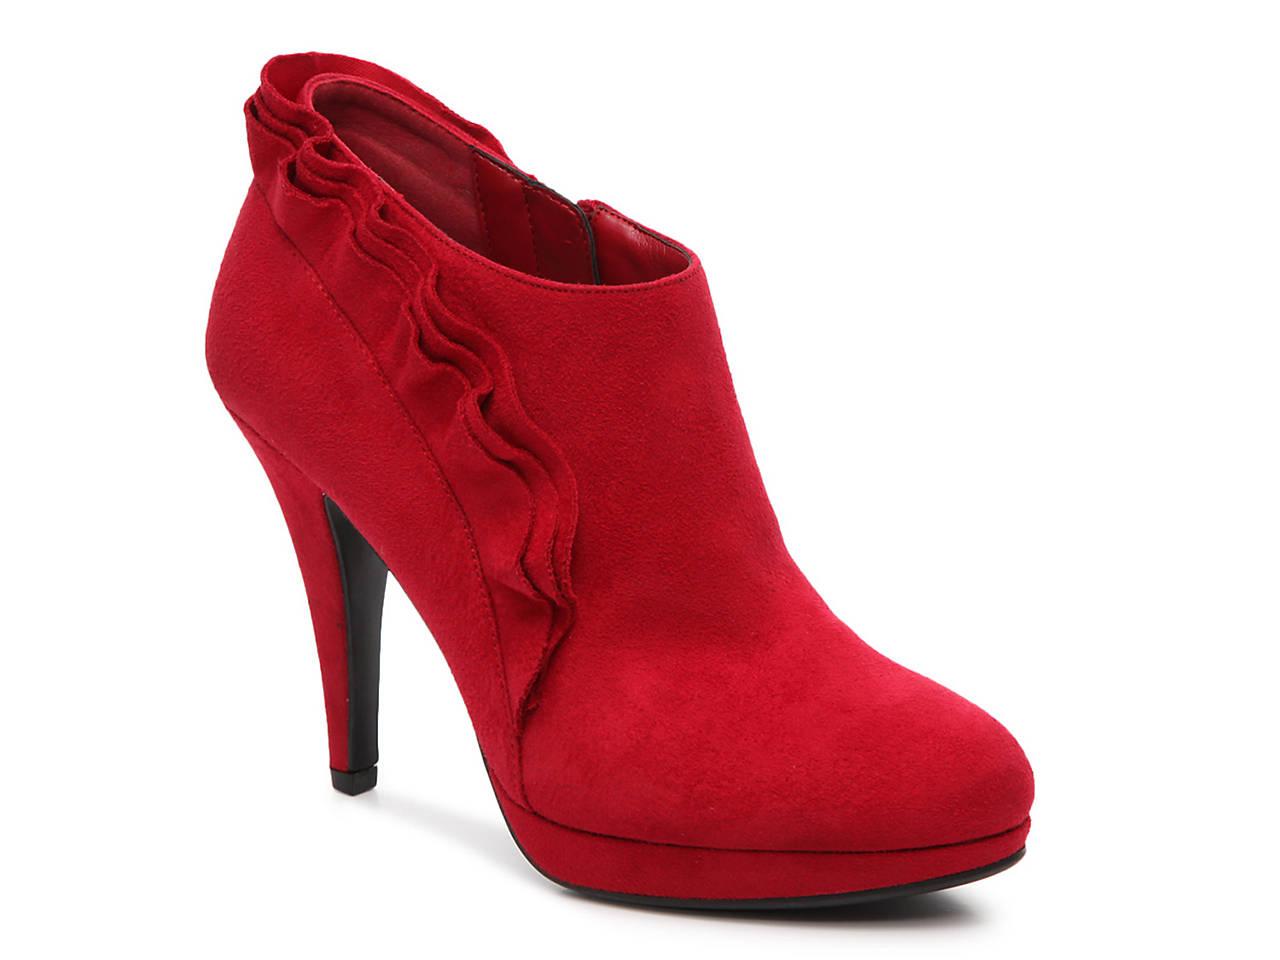 dbe2a7ee16ee0 Impo Priscilla Platform Bootie Women's Shoes | DSW